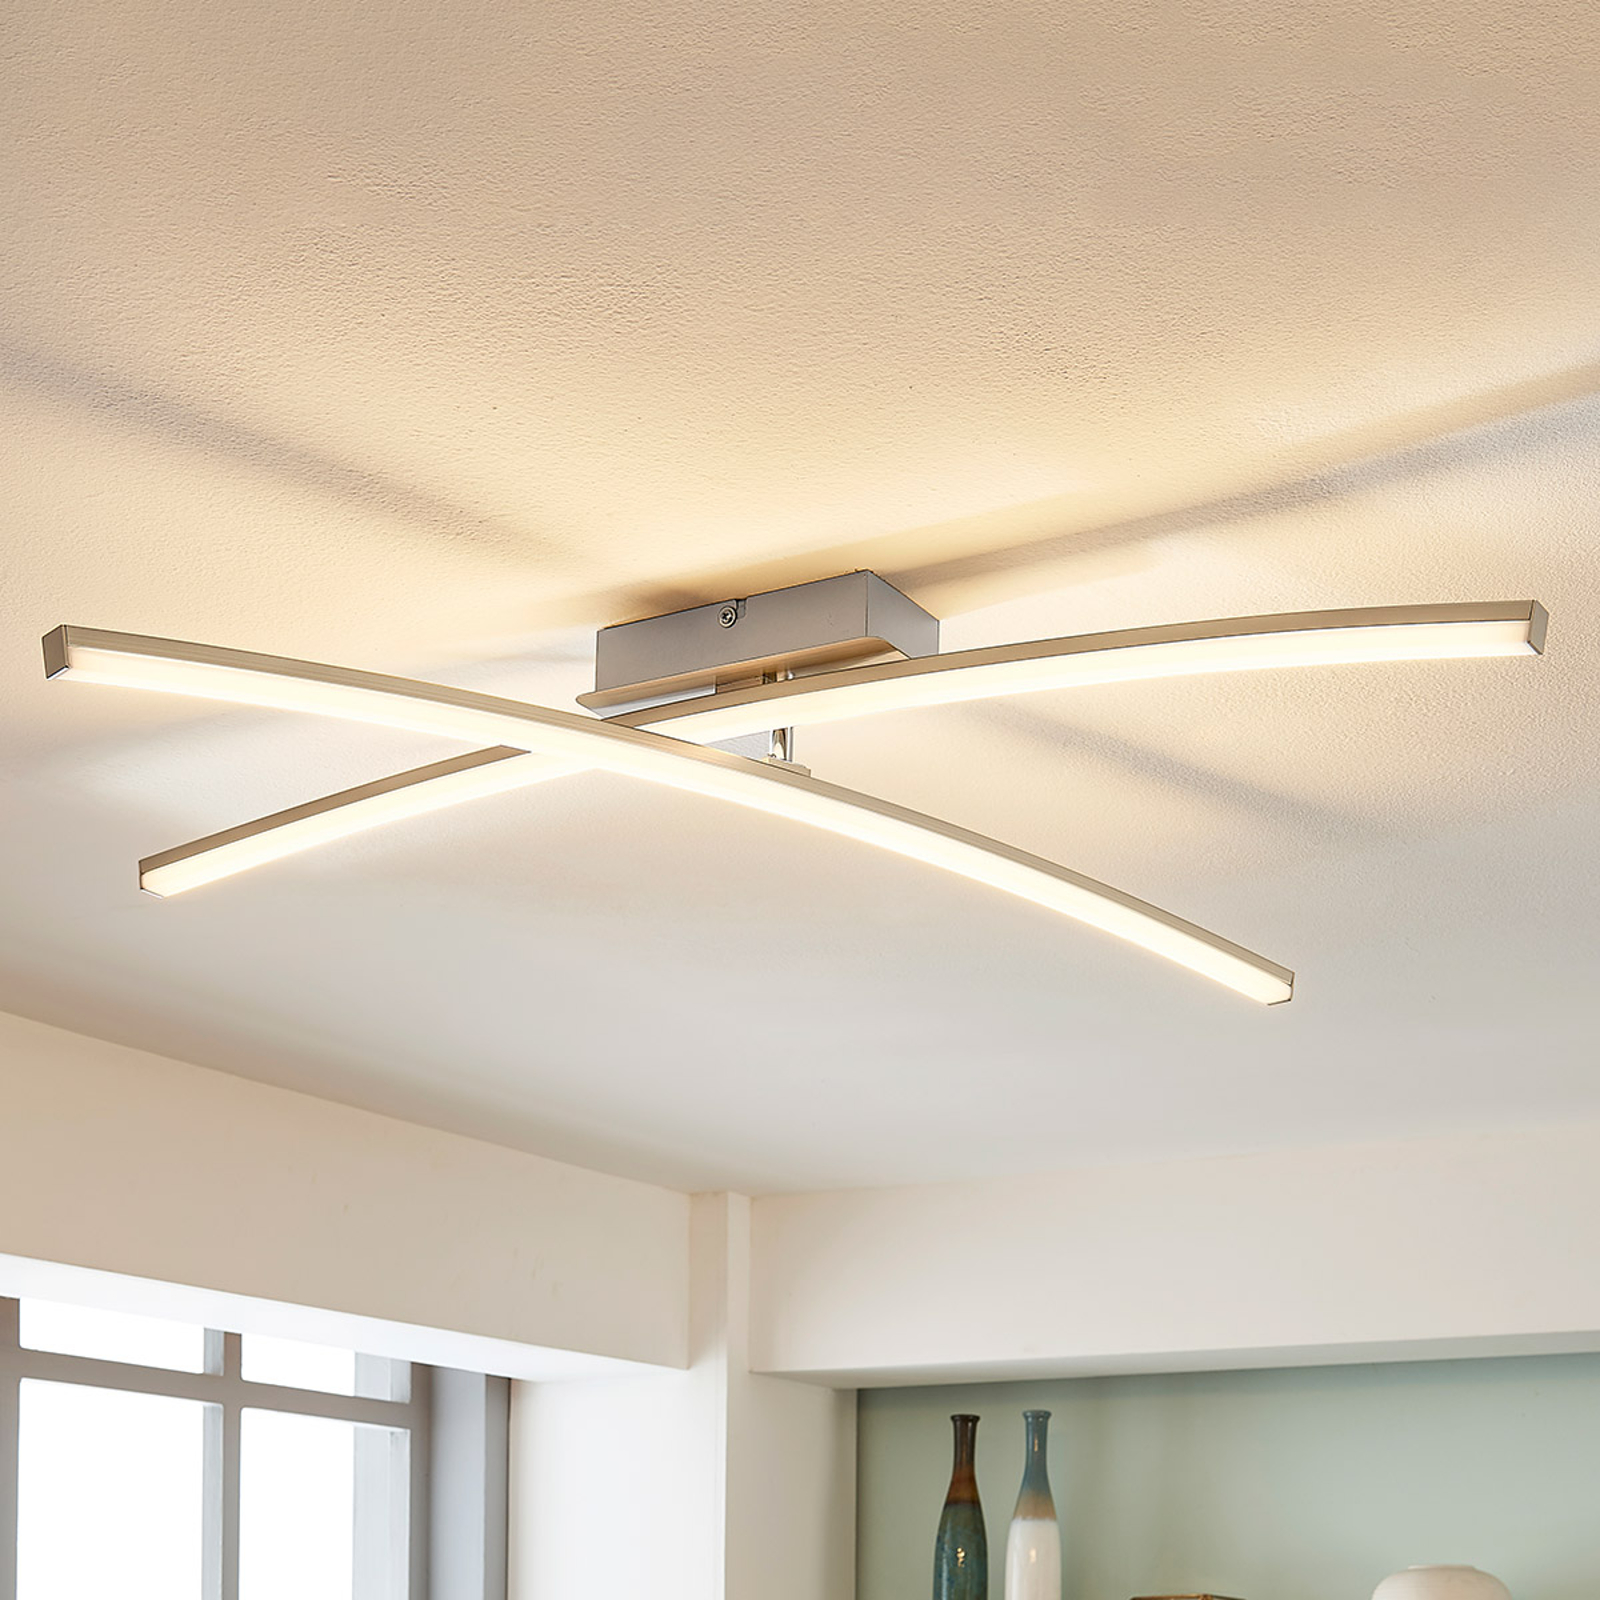 Laurenzia - dimbar LED-taklampe i krom